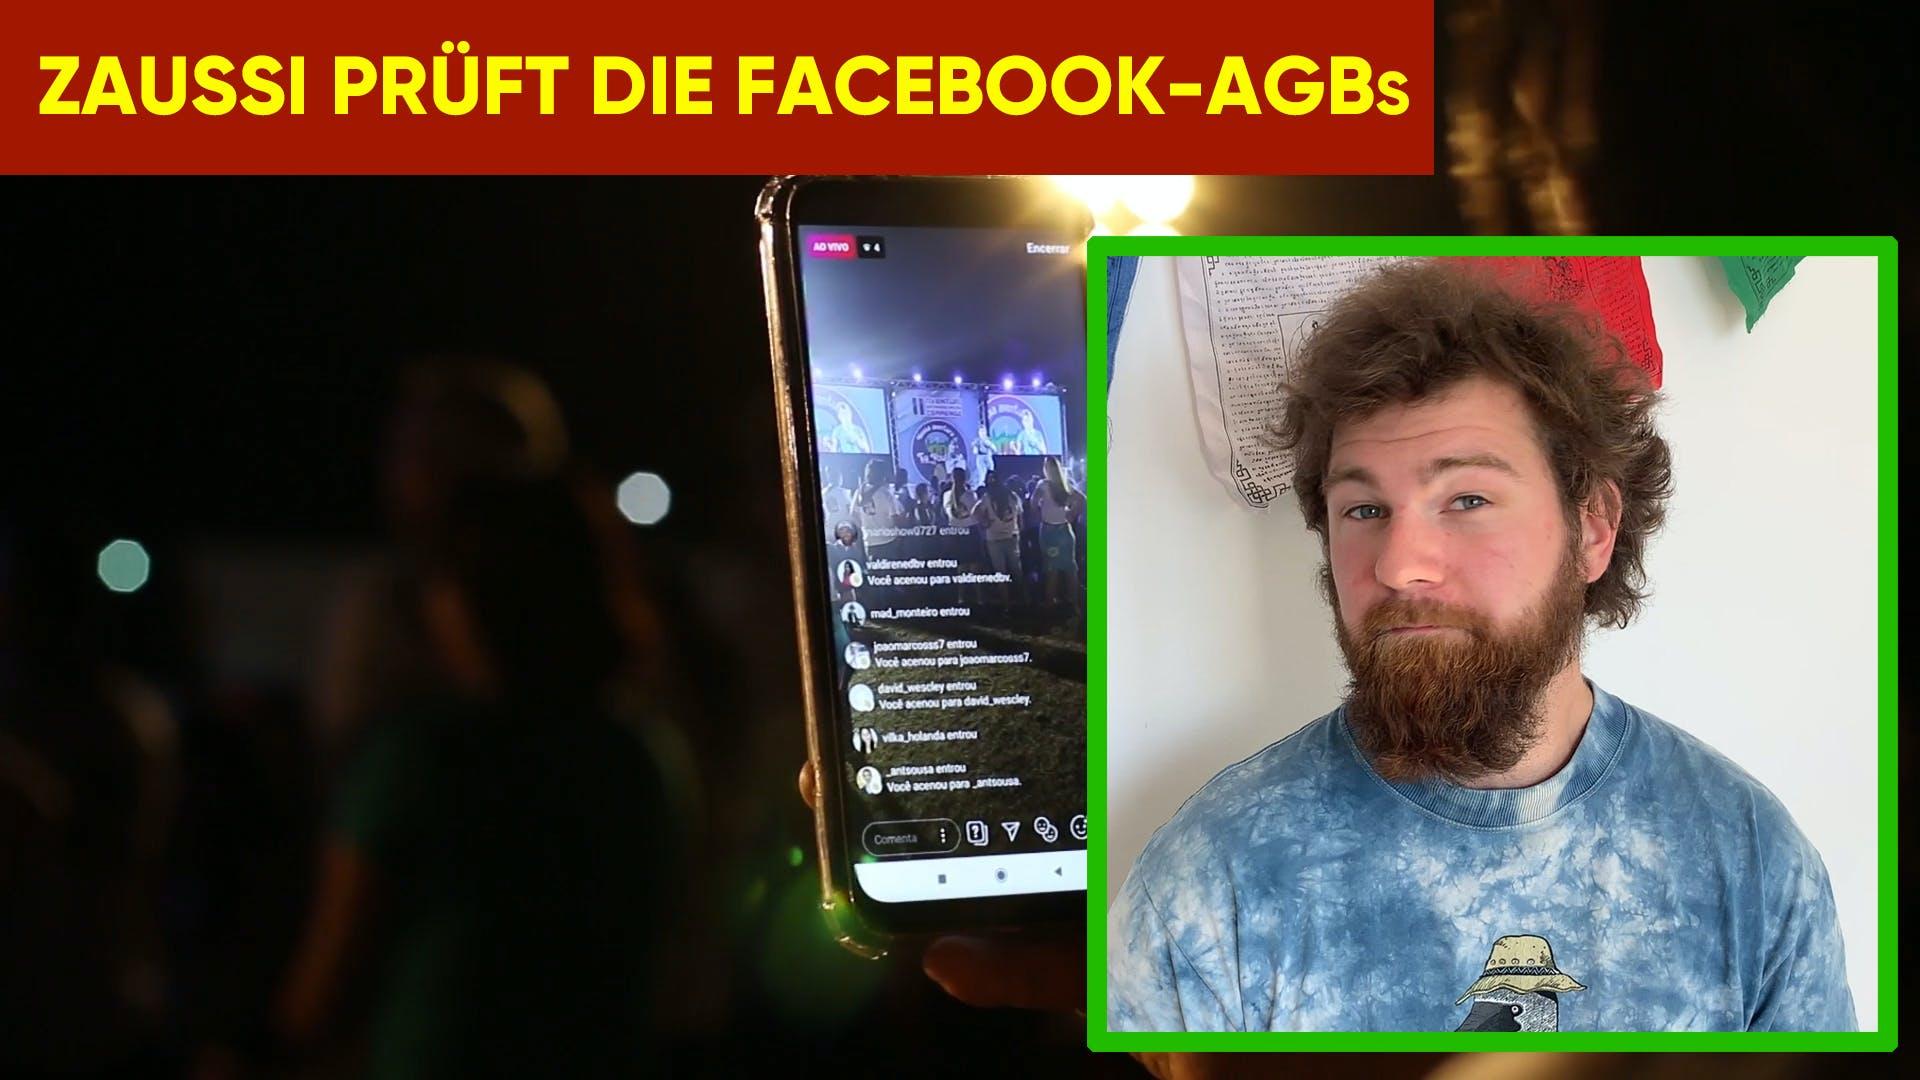 Zaussi prüft Digitalisierung 3: Facebook-AGB